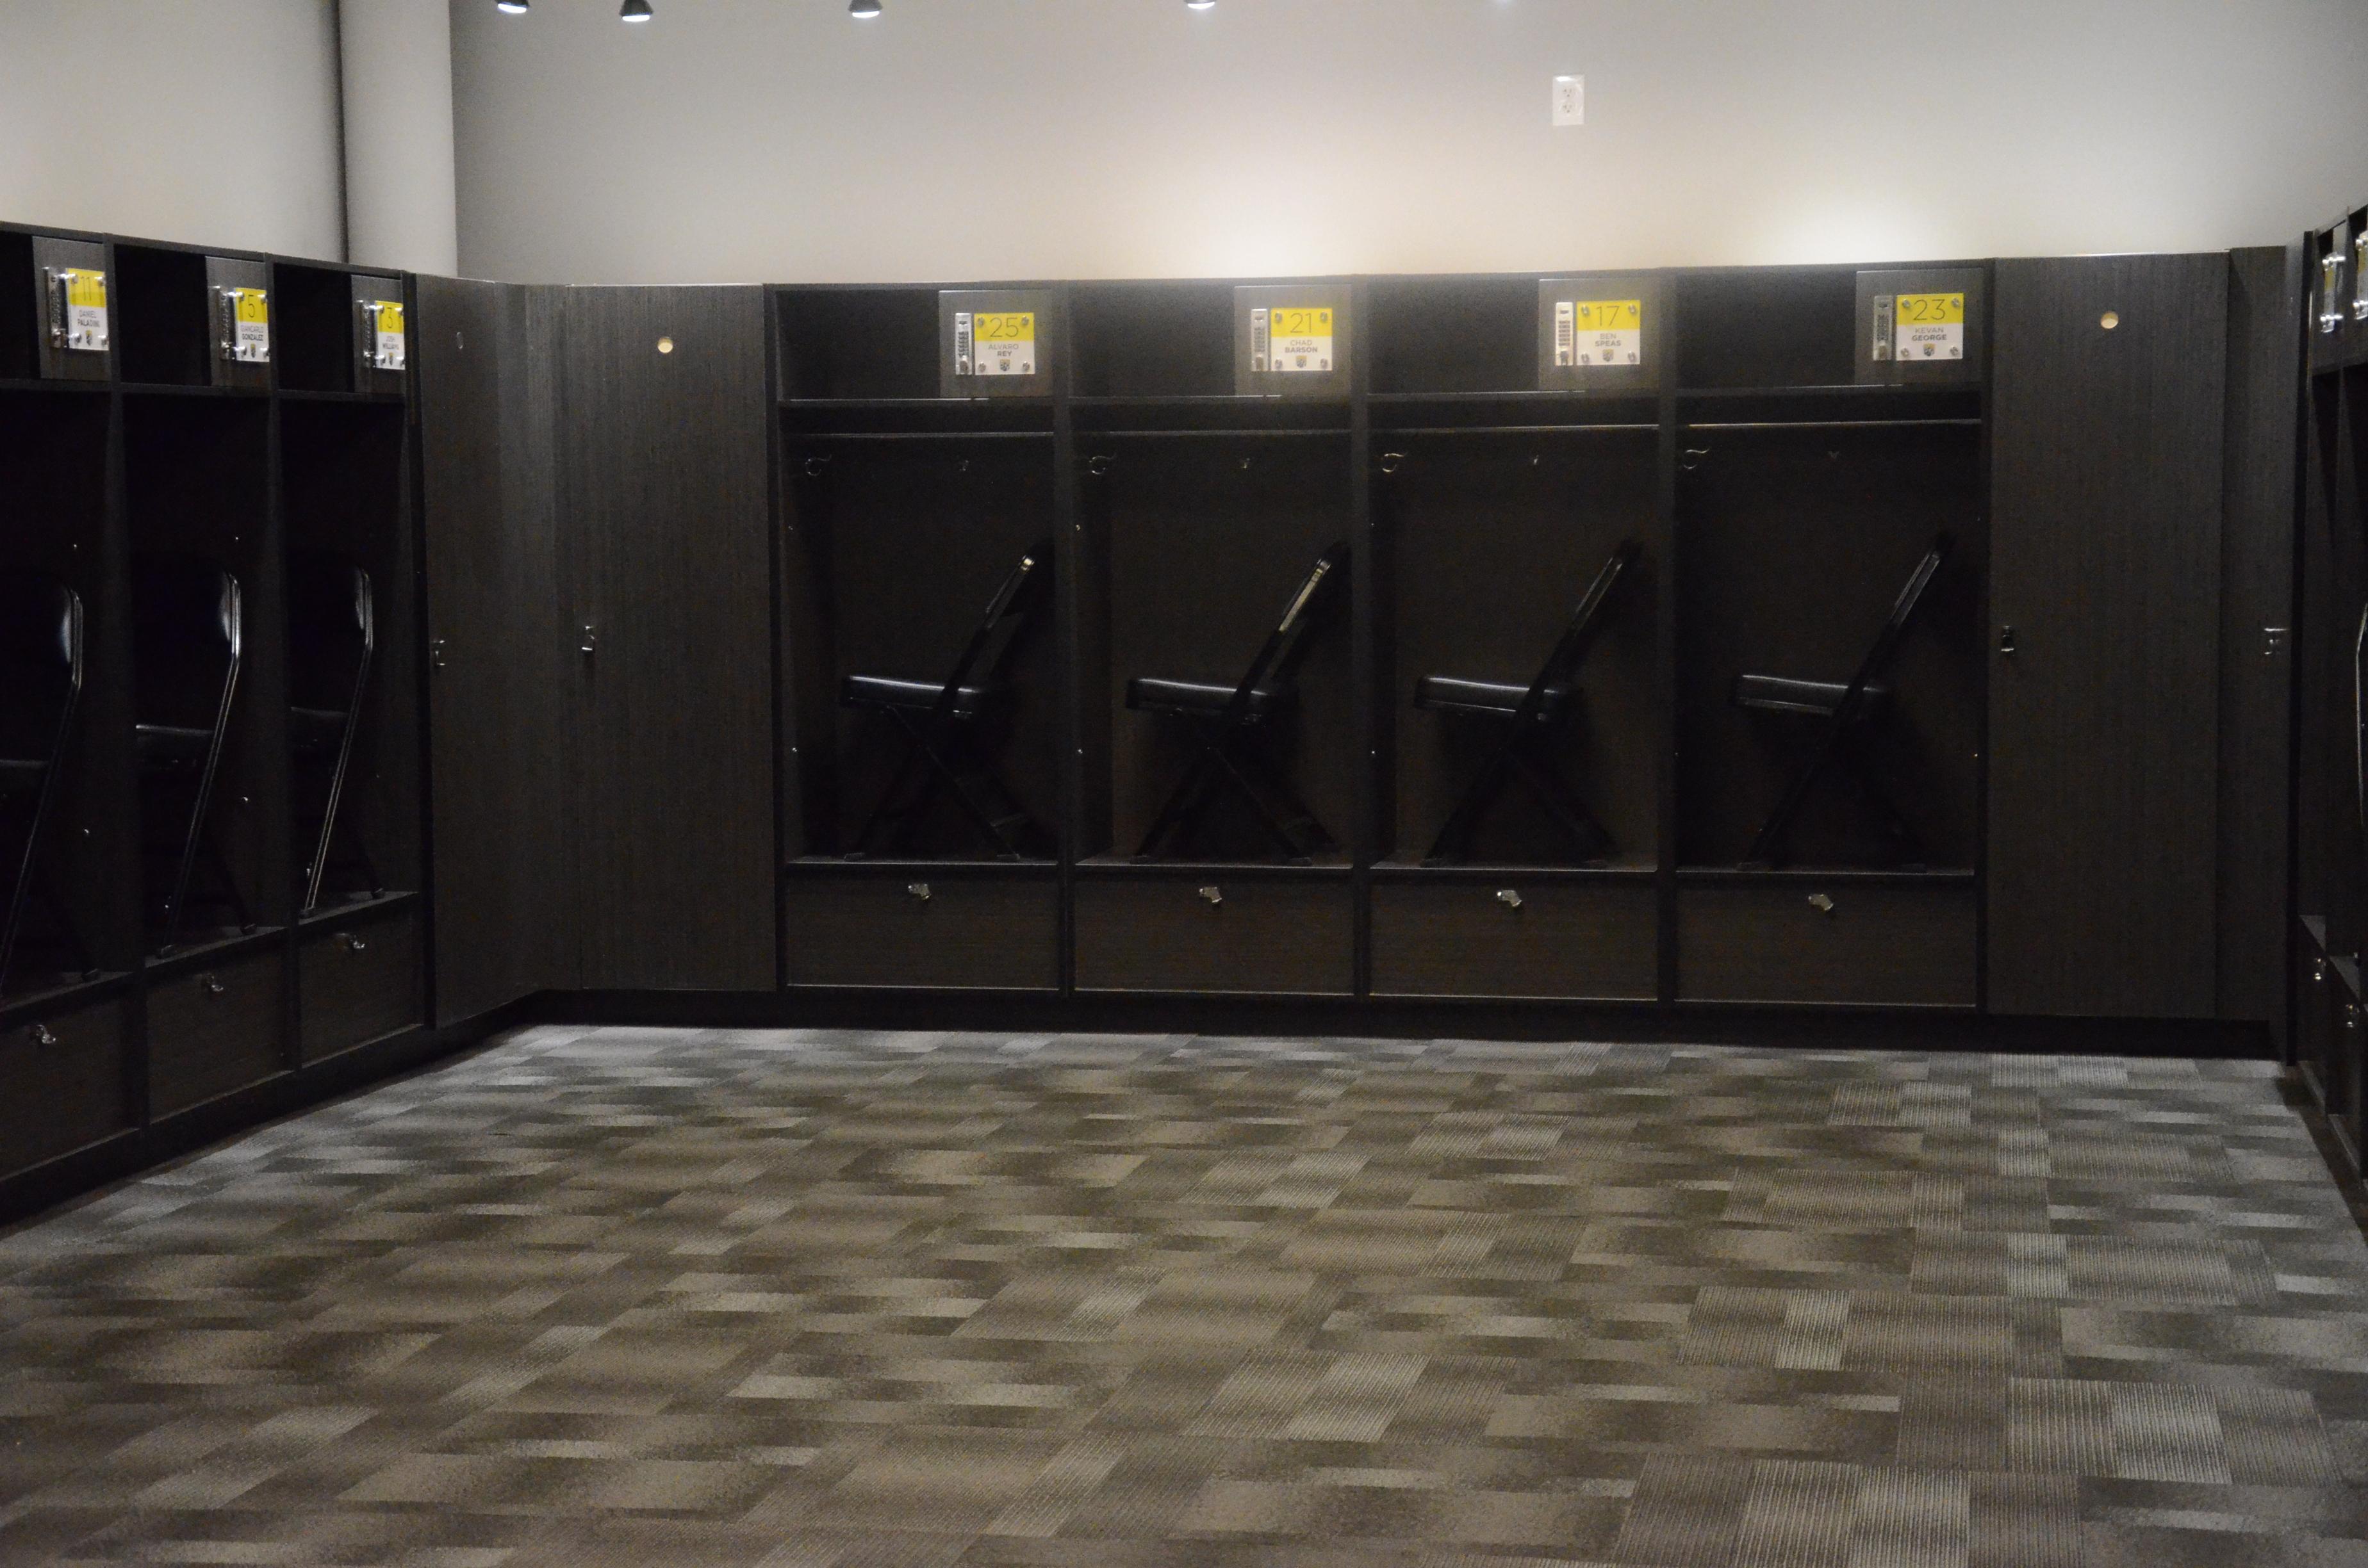 Anime Locker Room Background